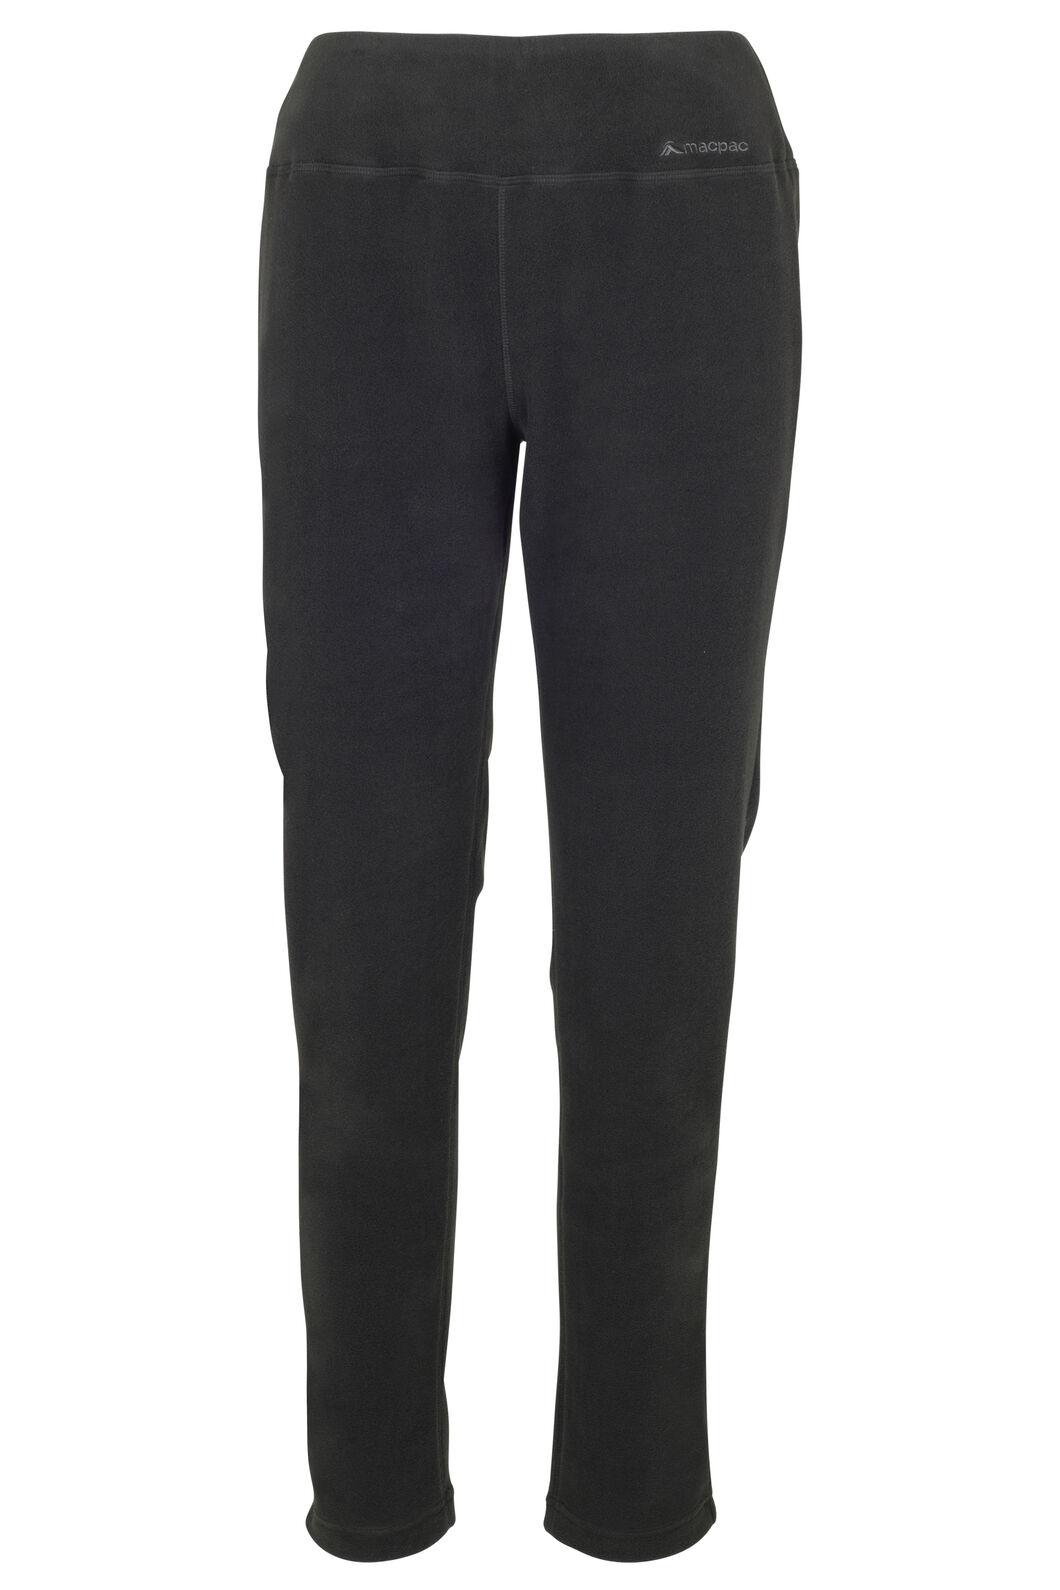 Macpac Tui Polartec® Micro Fleece® Pants — Women's, Black, hi-res